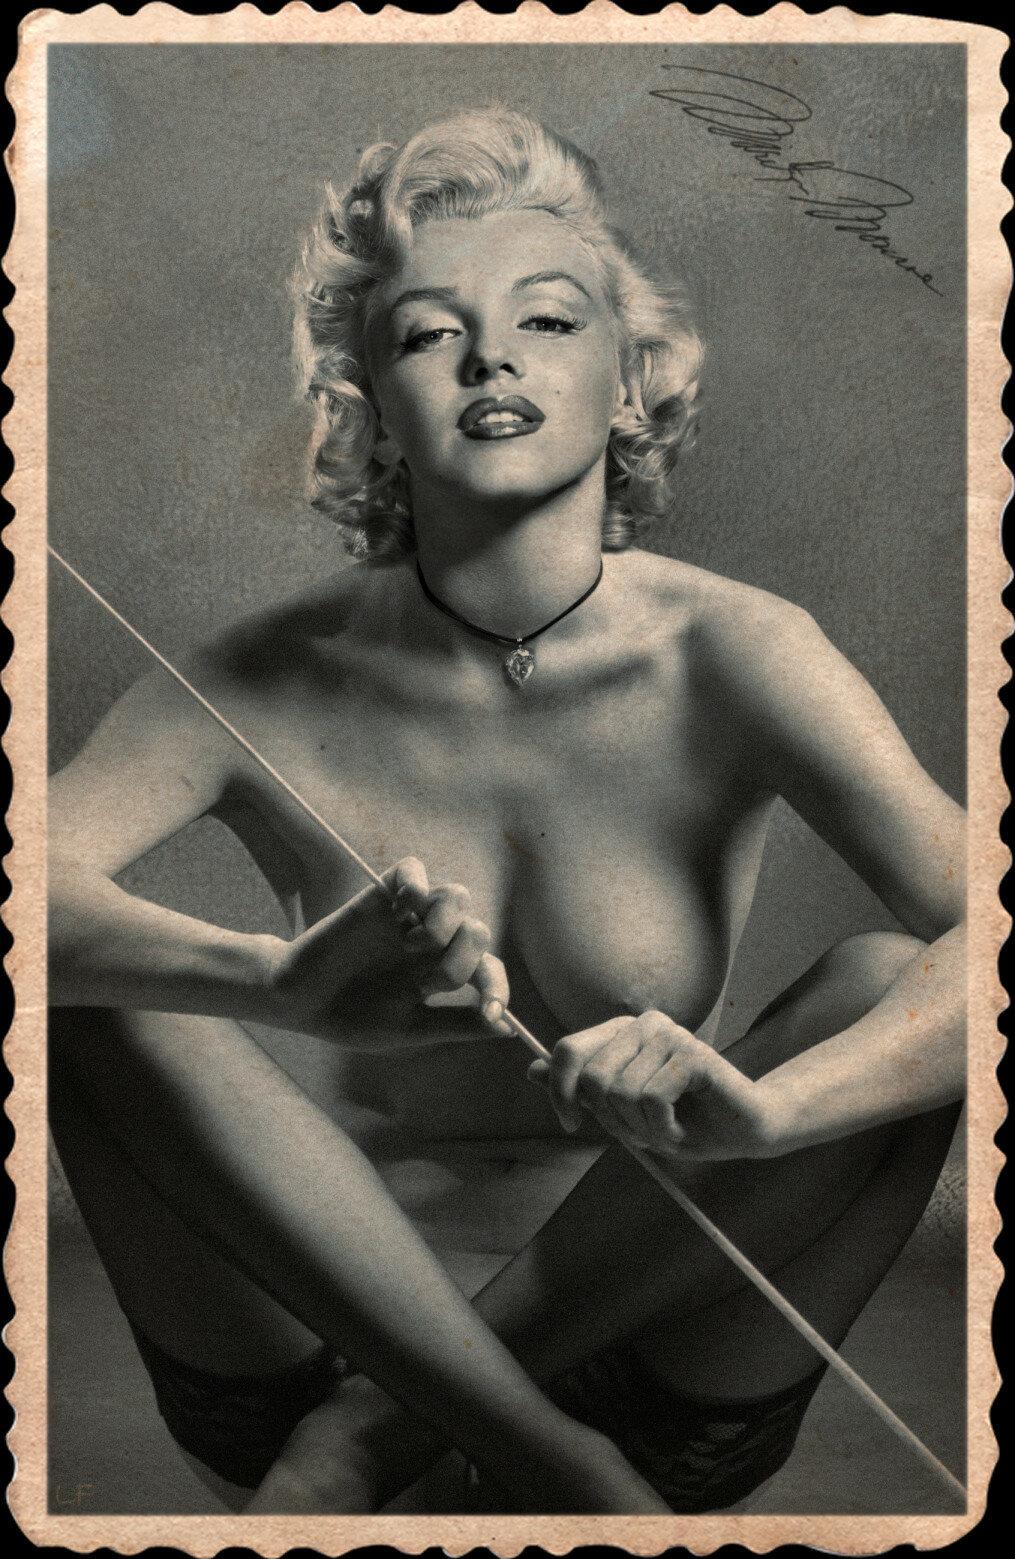 Marilyn monroe real nude vagina pics, iron man fucking